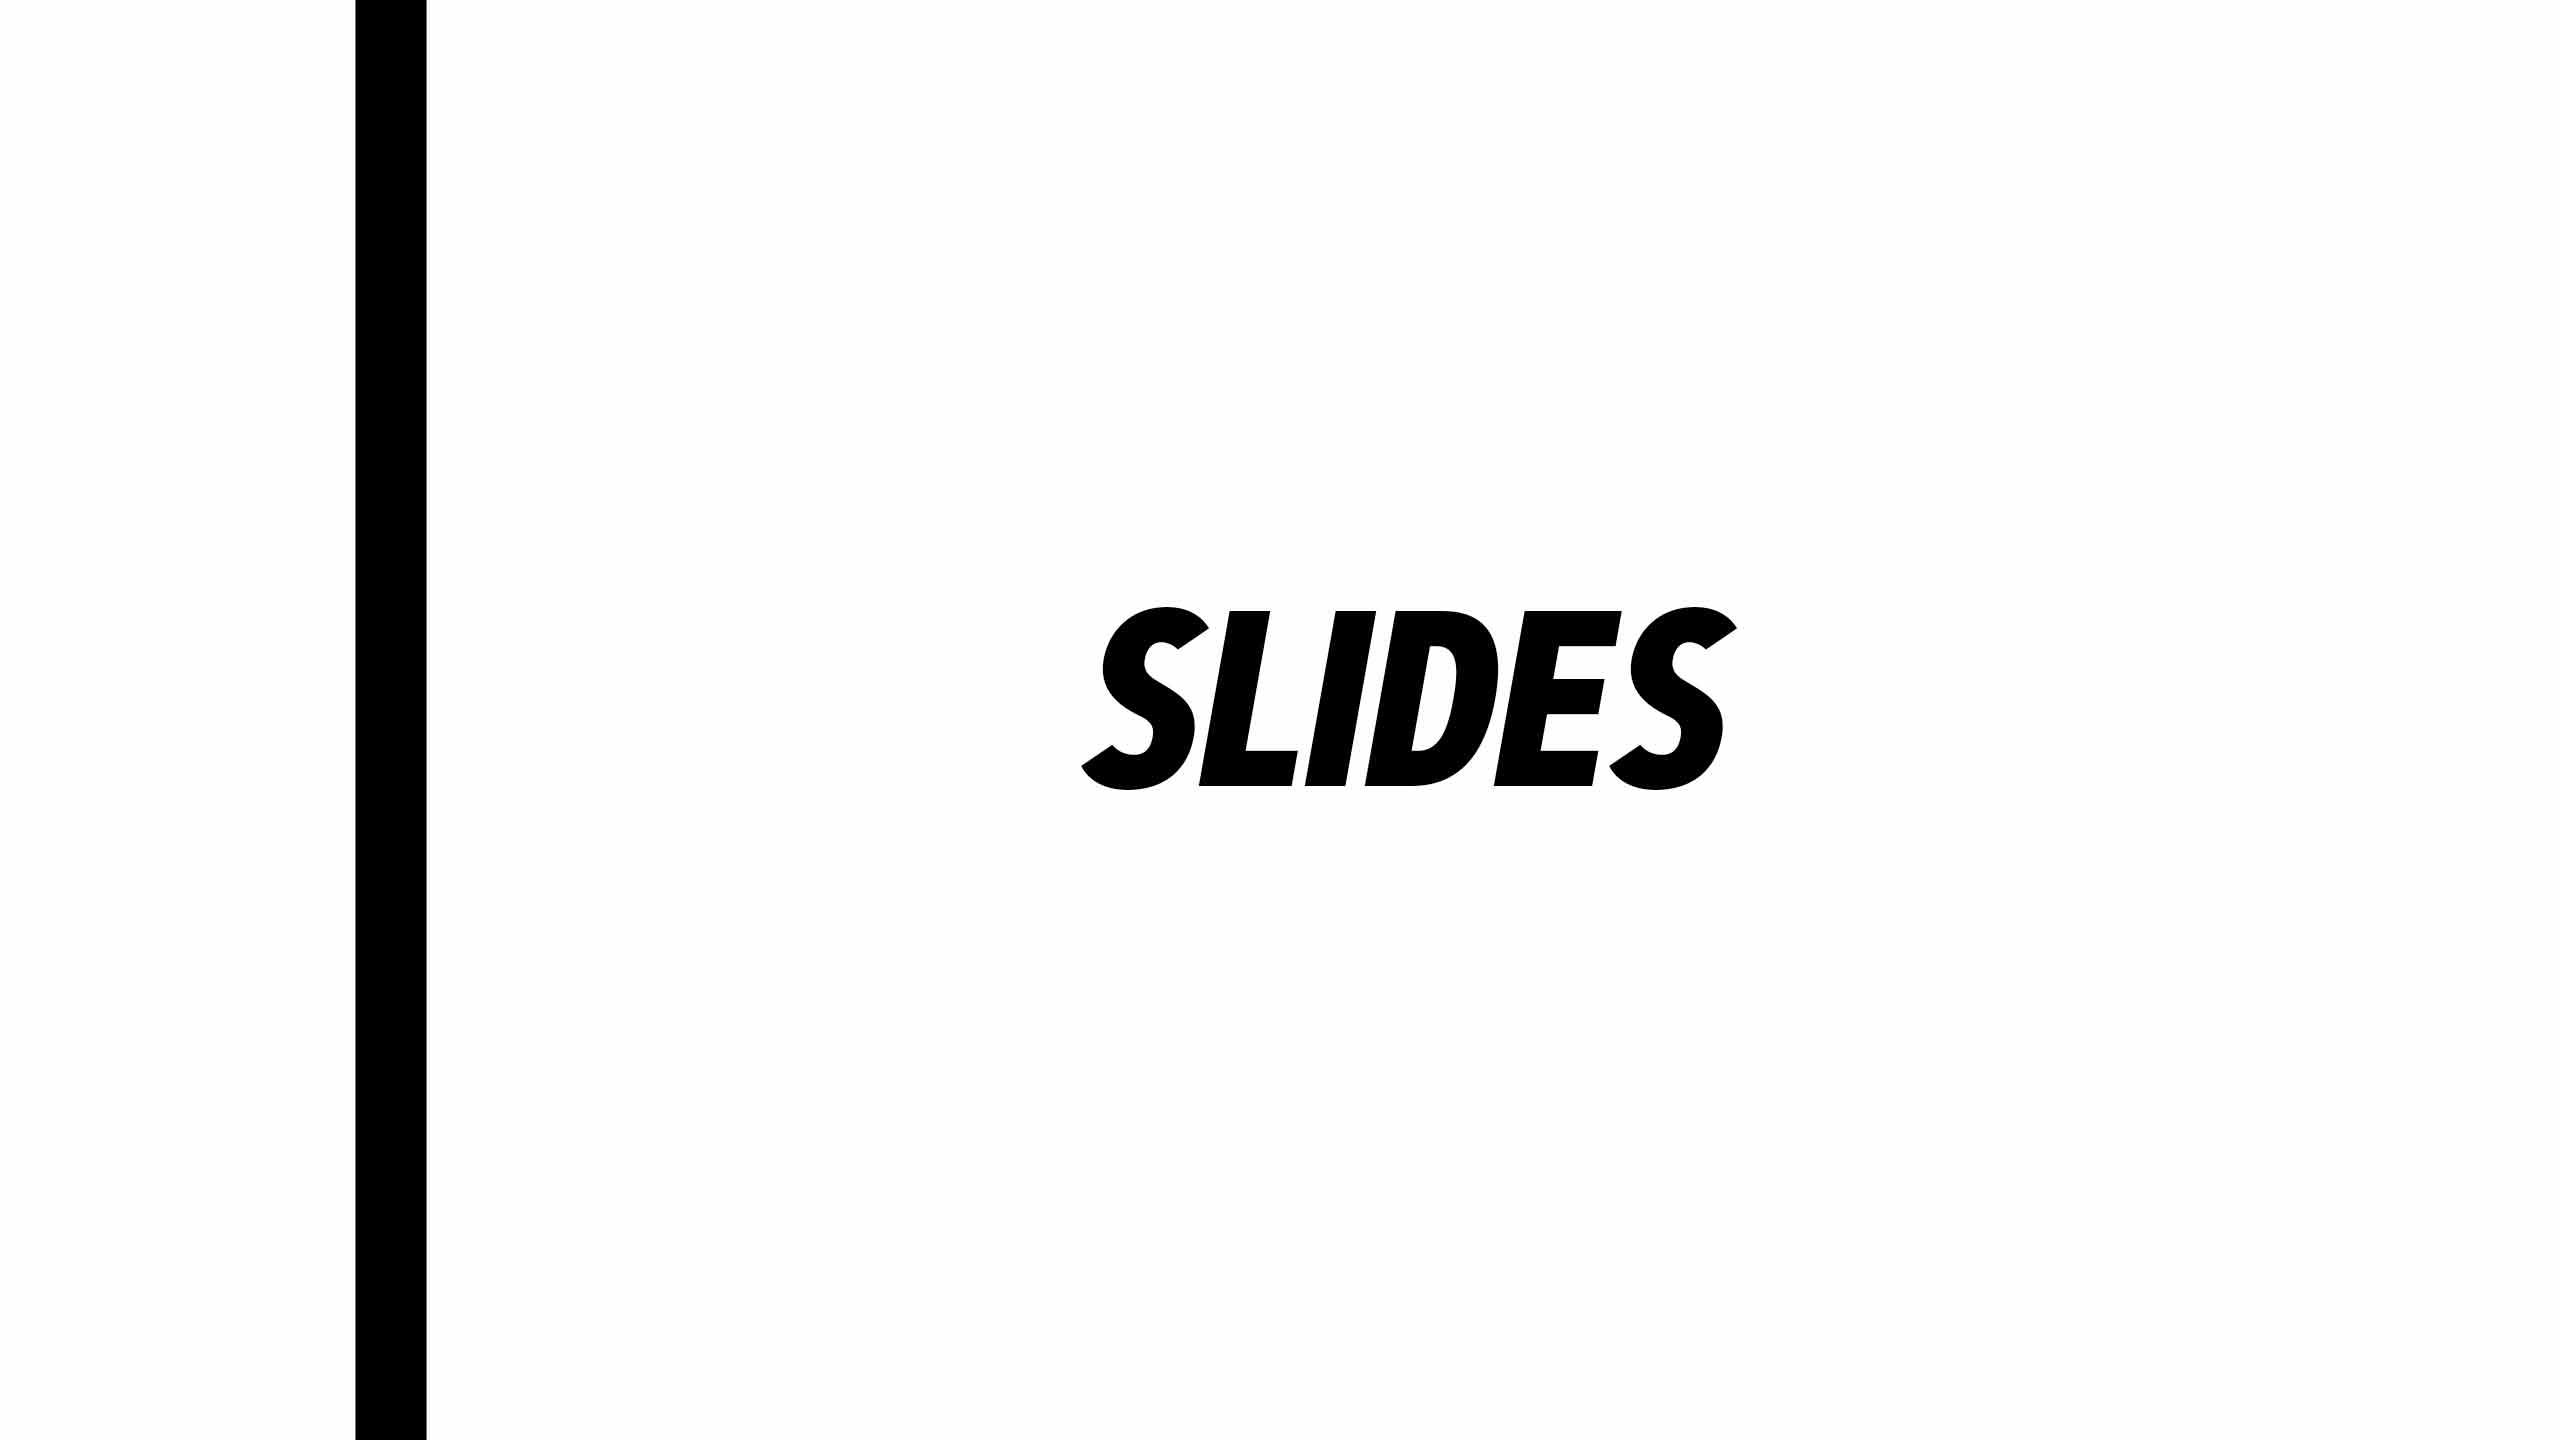 test-microsite-slides-2018